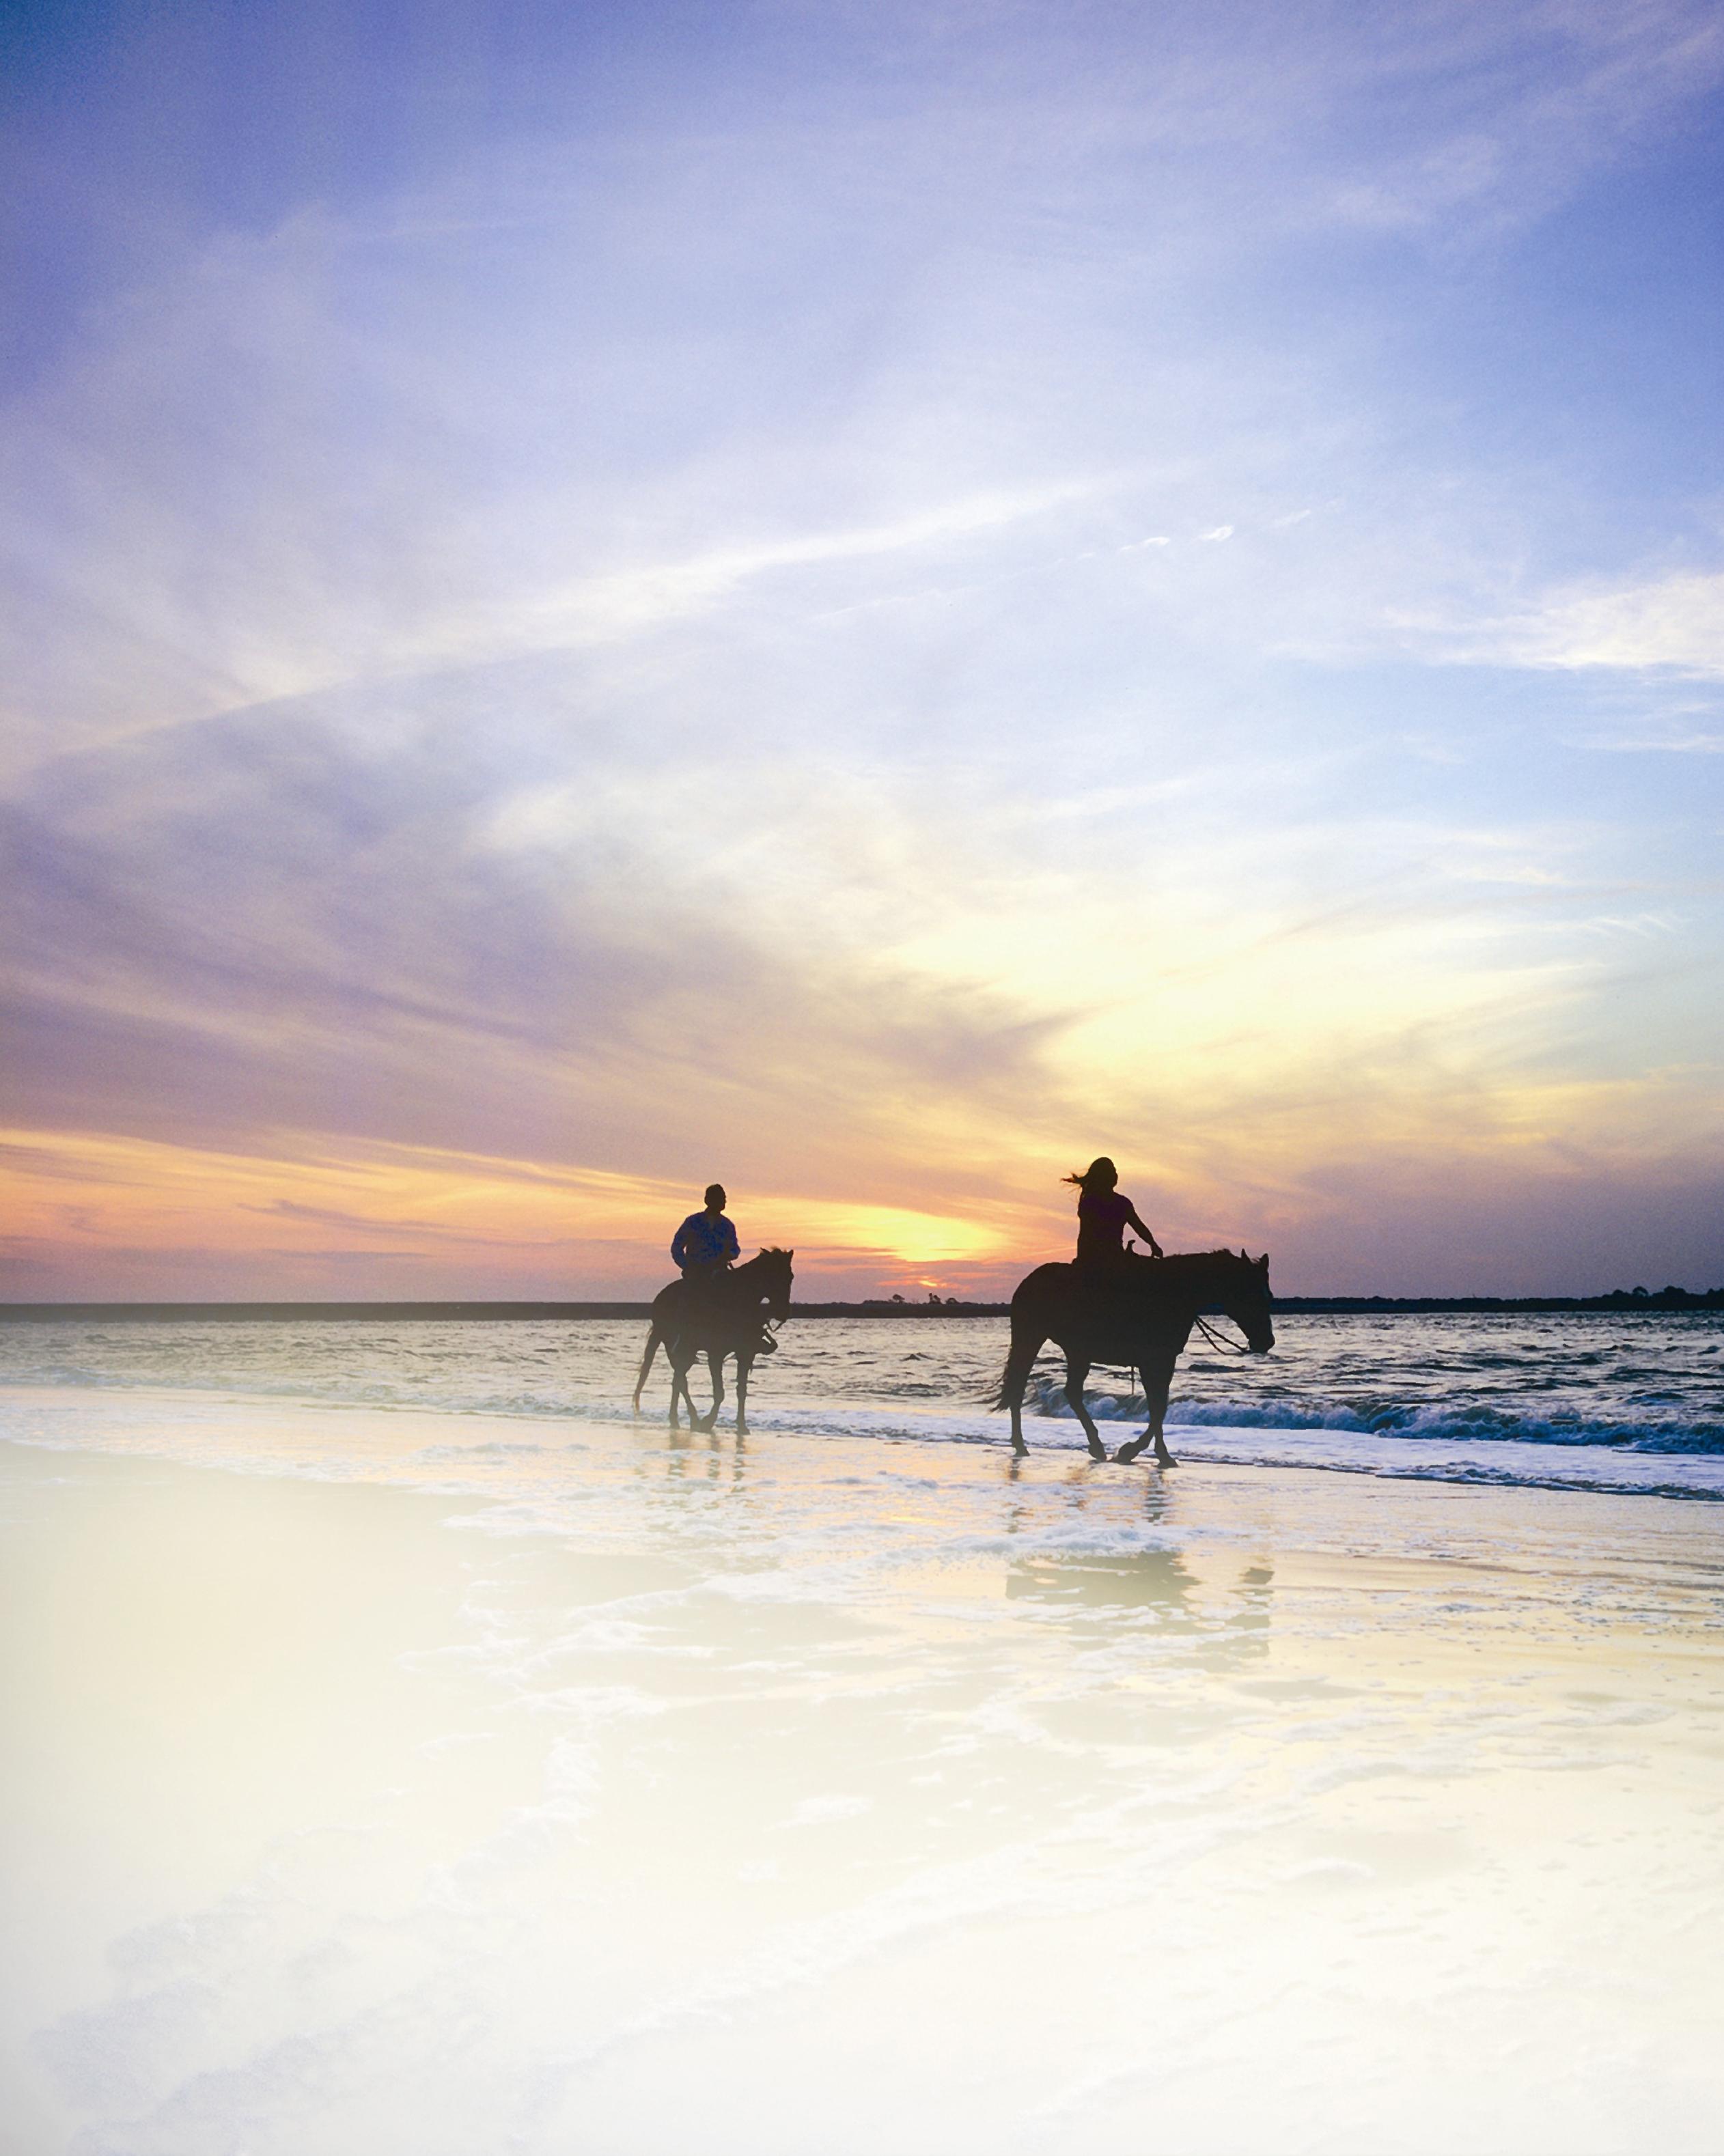 us-islands-amelia-horses-surf-beach-1115.jpg